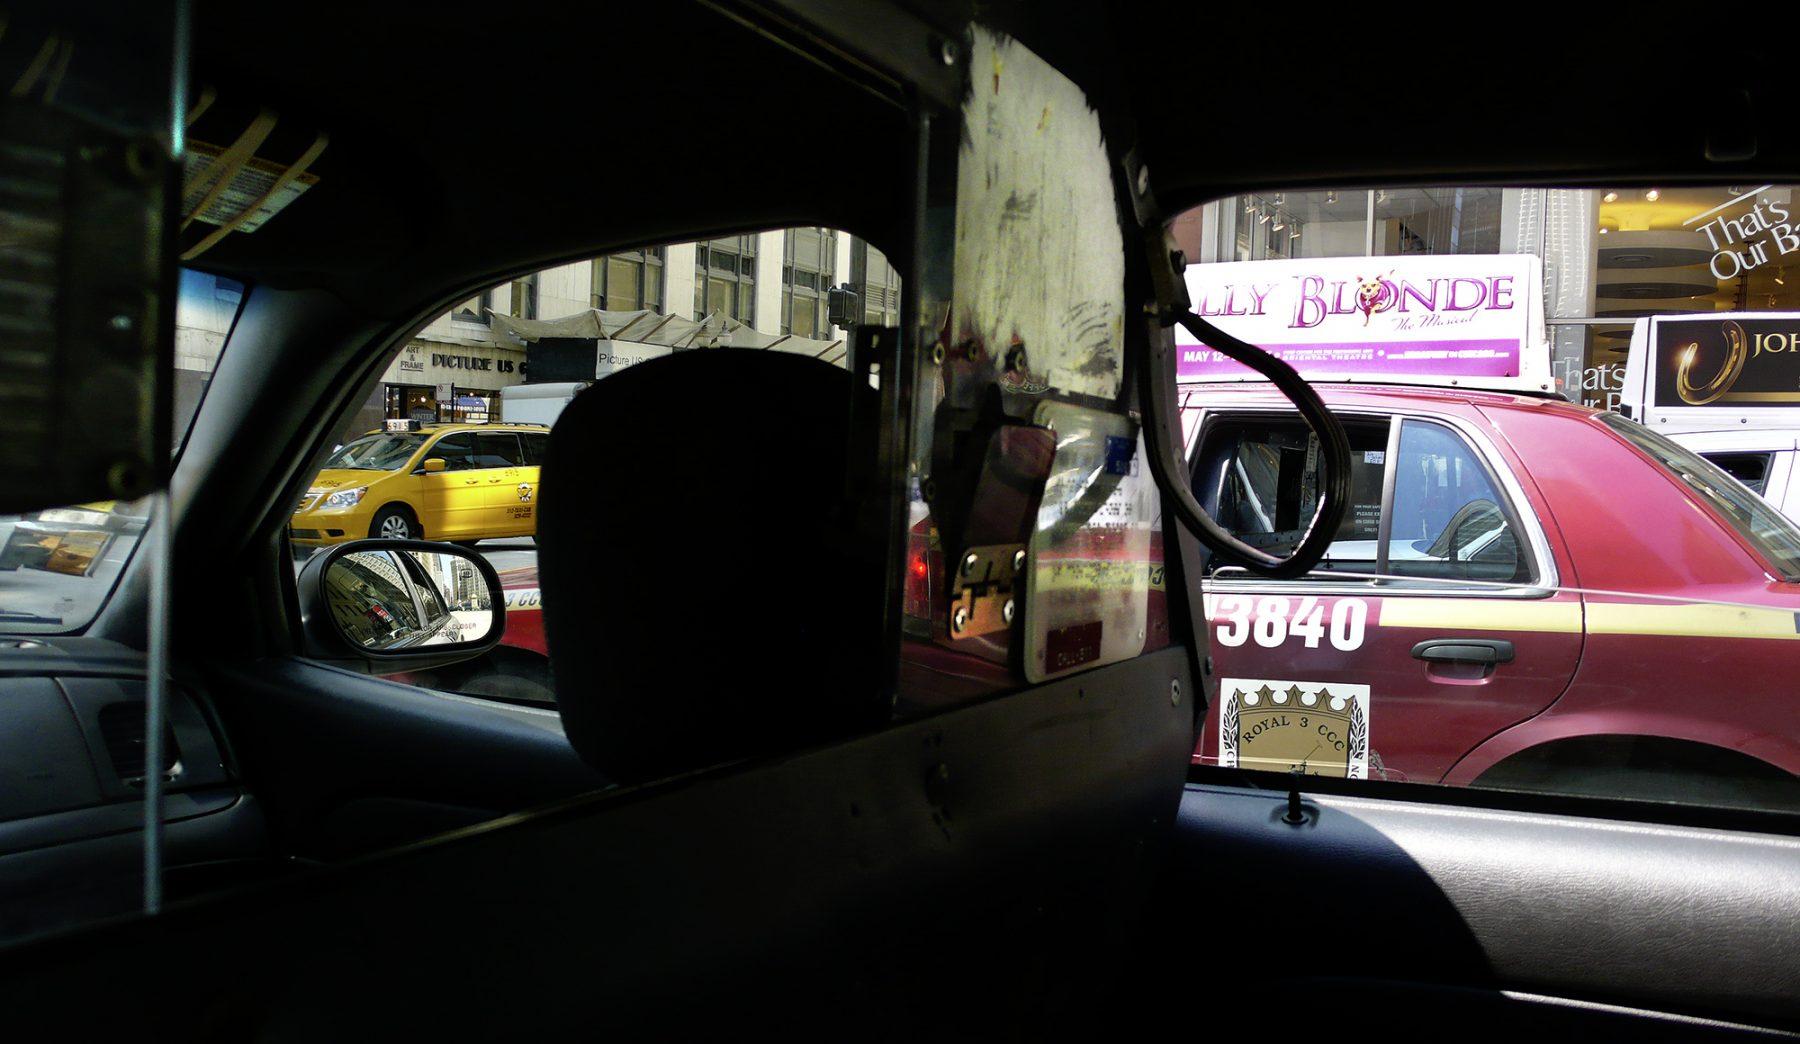 Ausdemautofenstertaxi